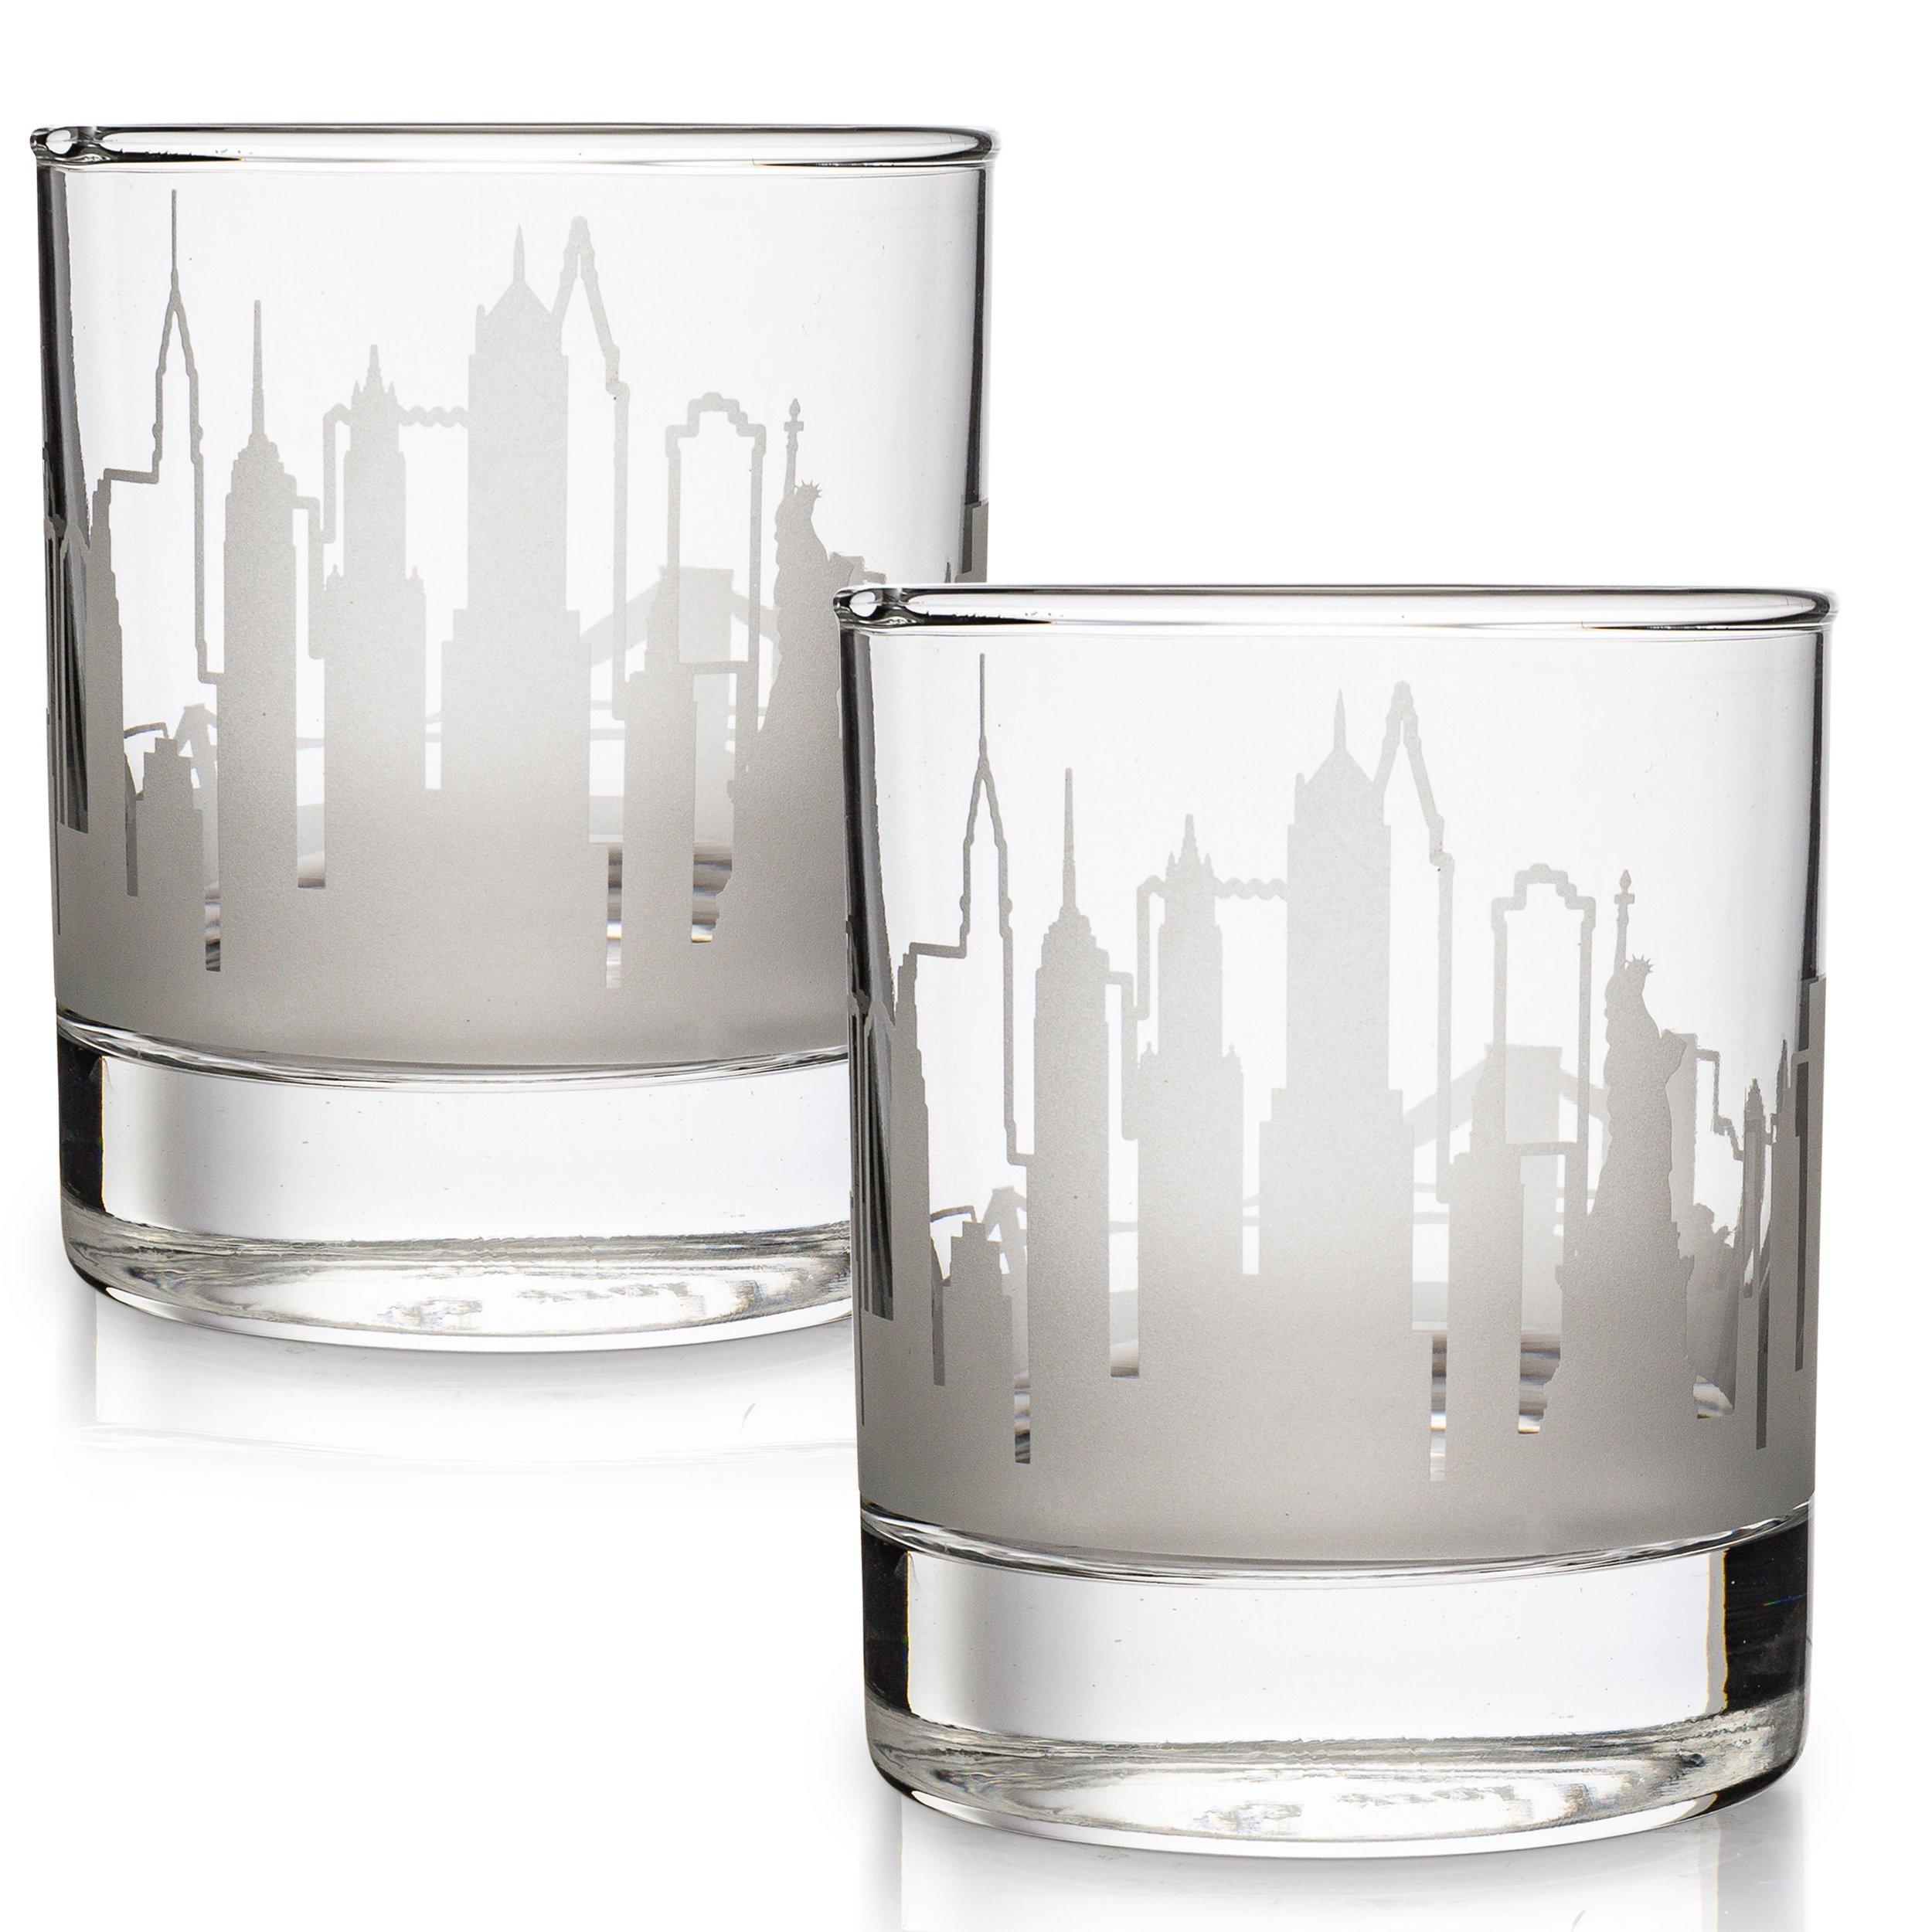 Etched New York Whiskey Glasses Gift Set | 2 Skyline Old Fashioned Tumblers - New York City, NY